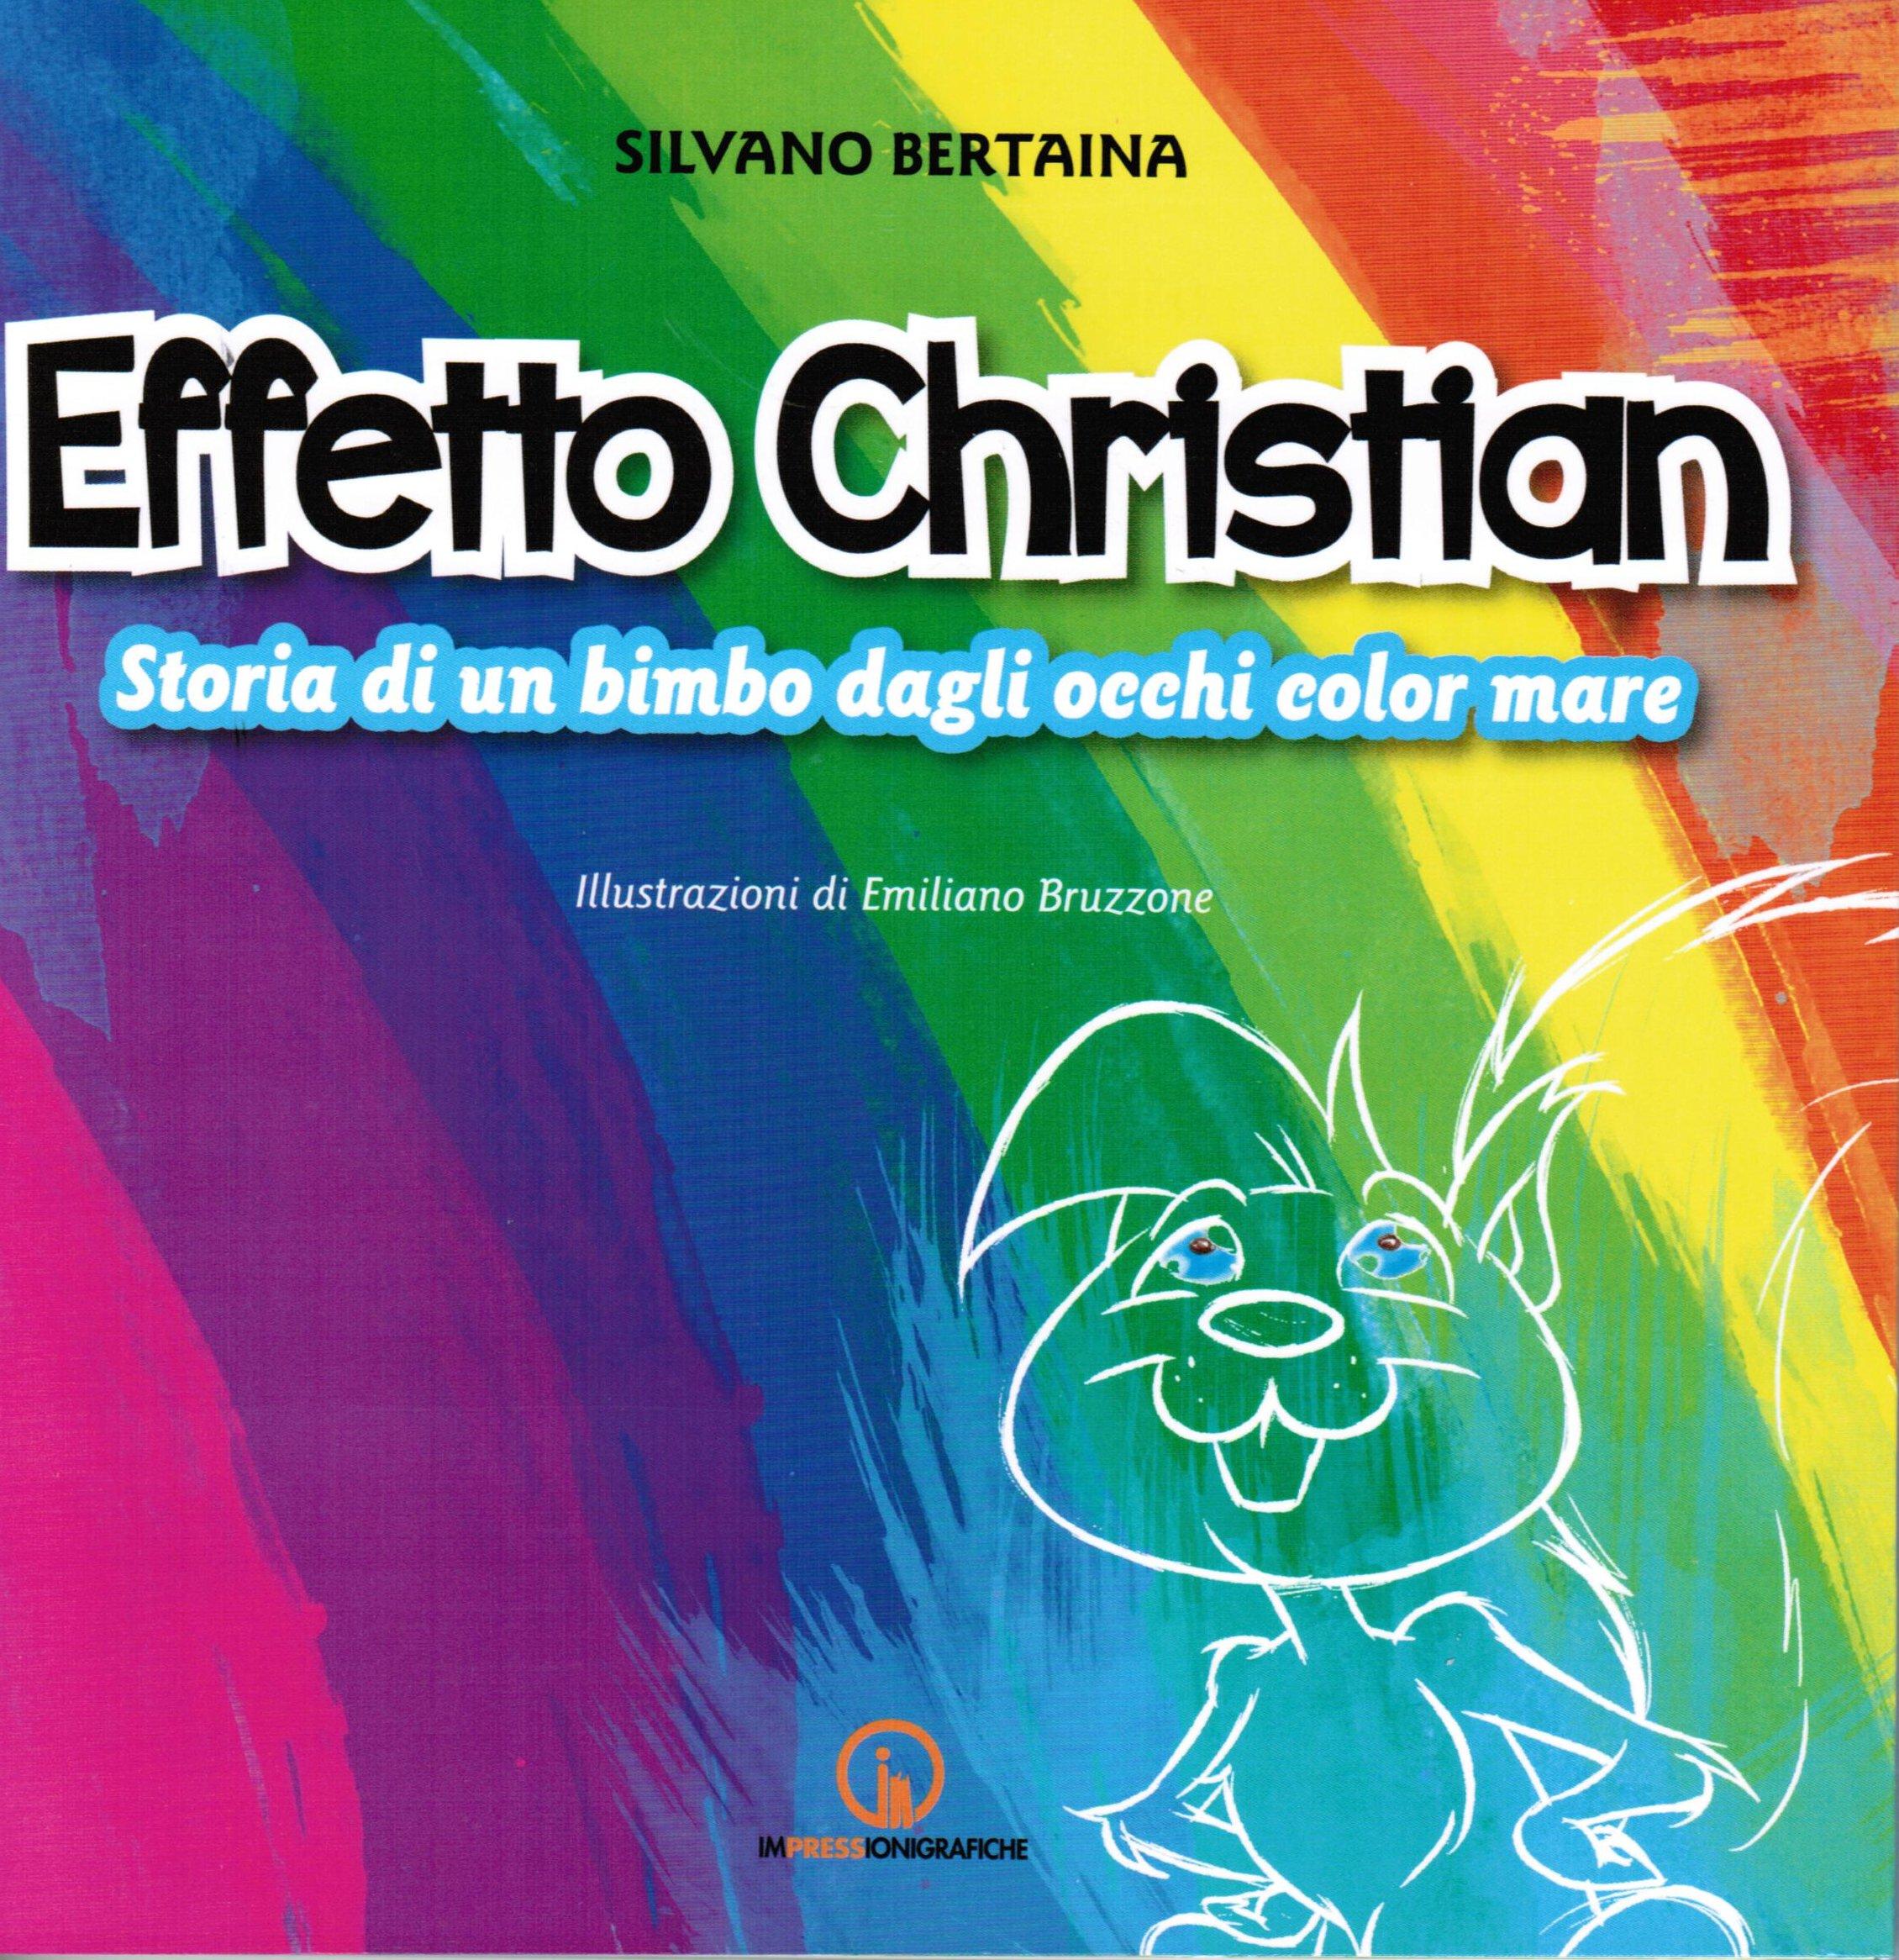 Effetto Christian